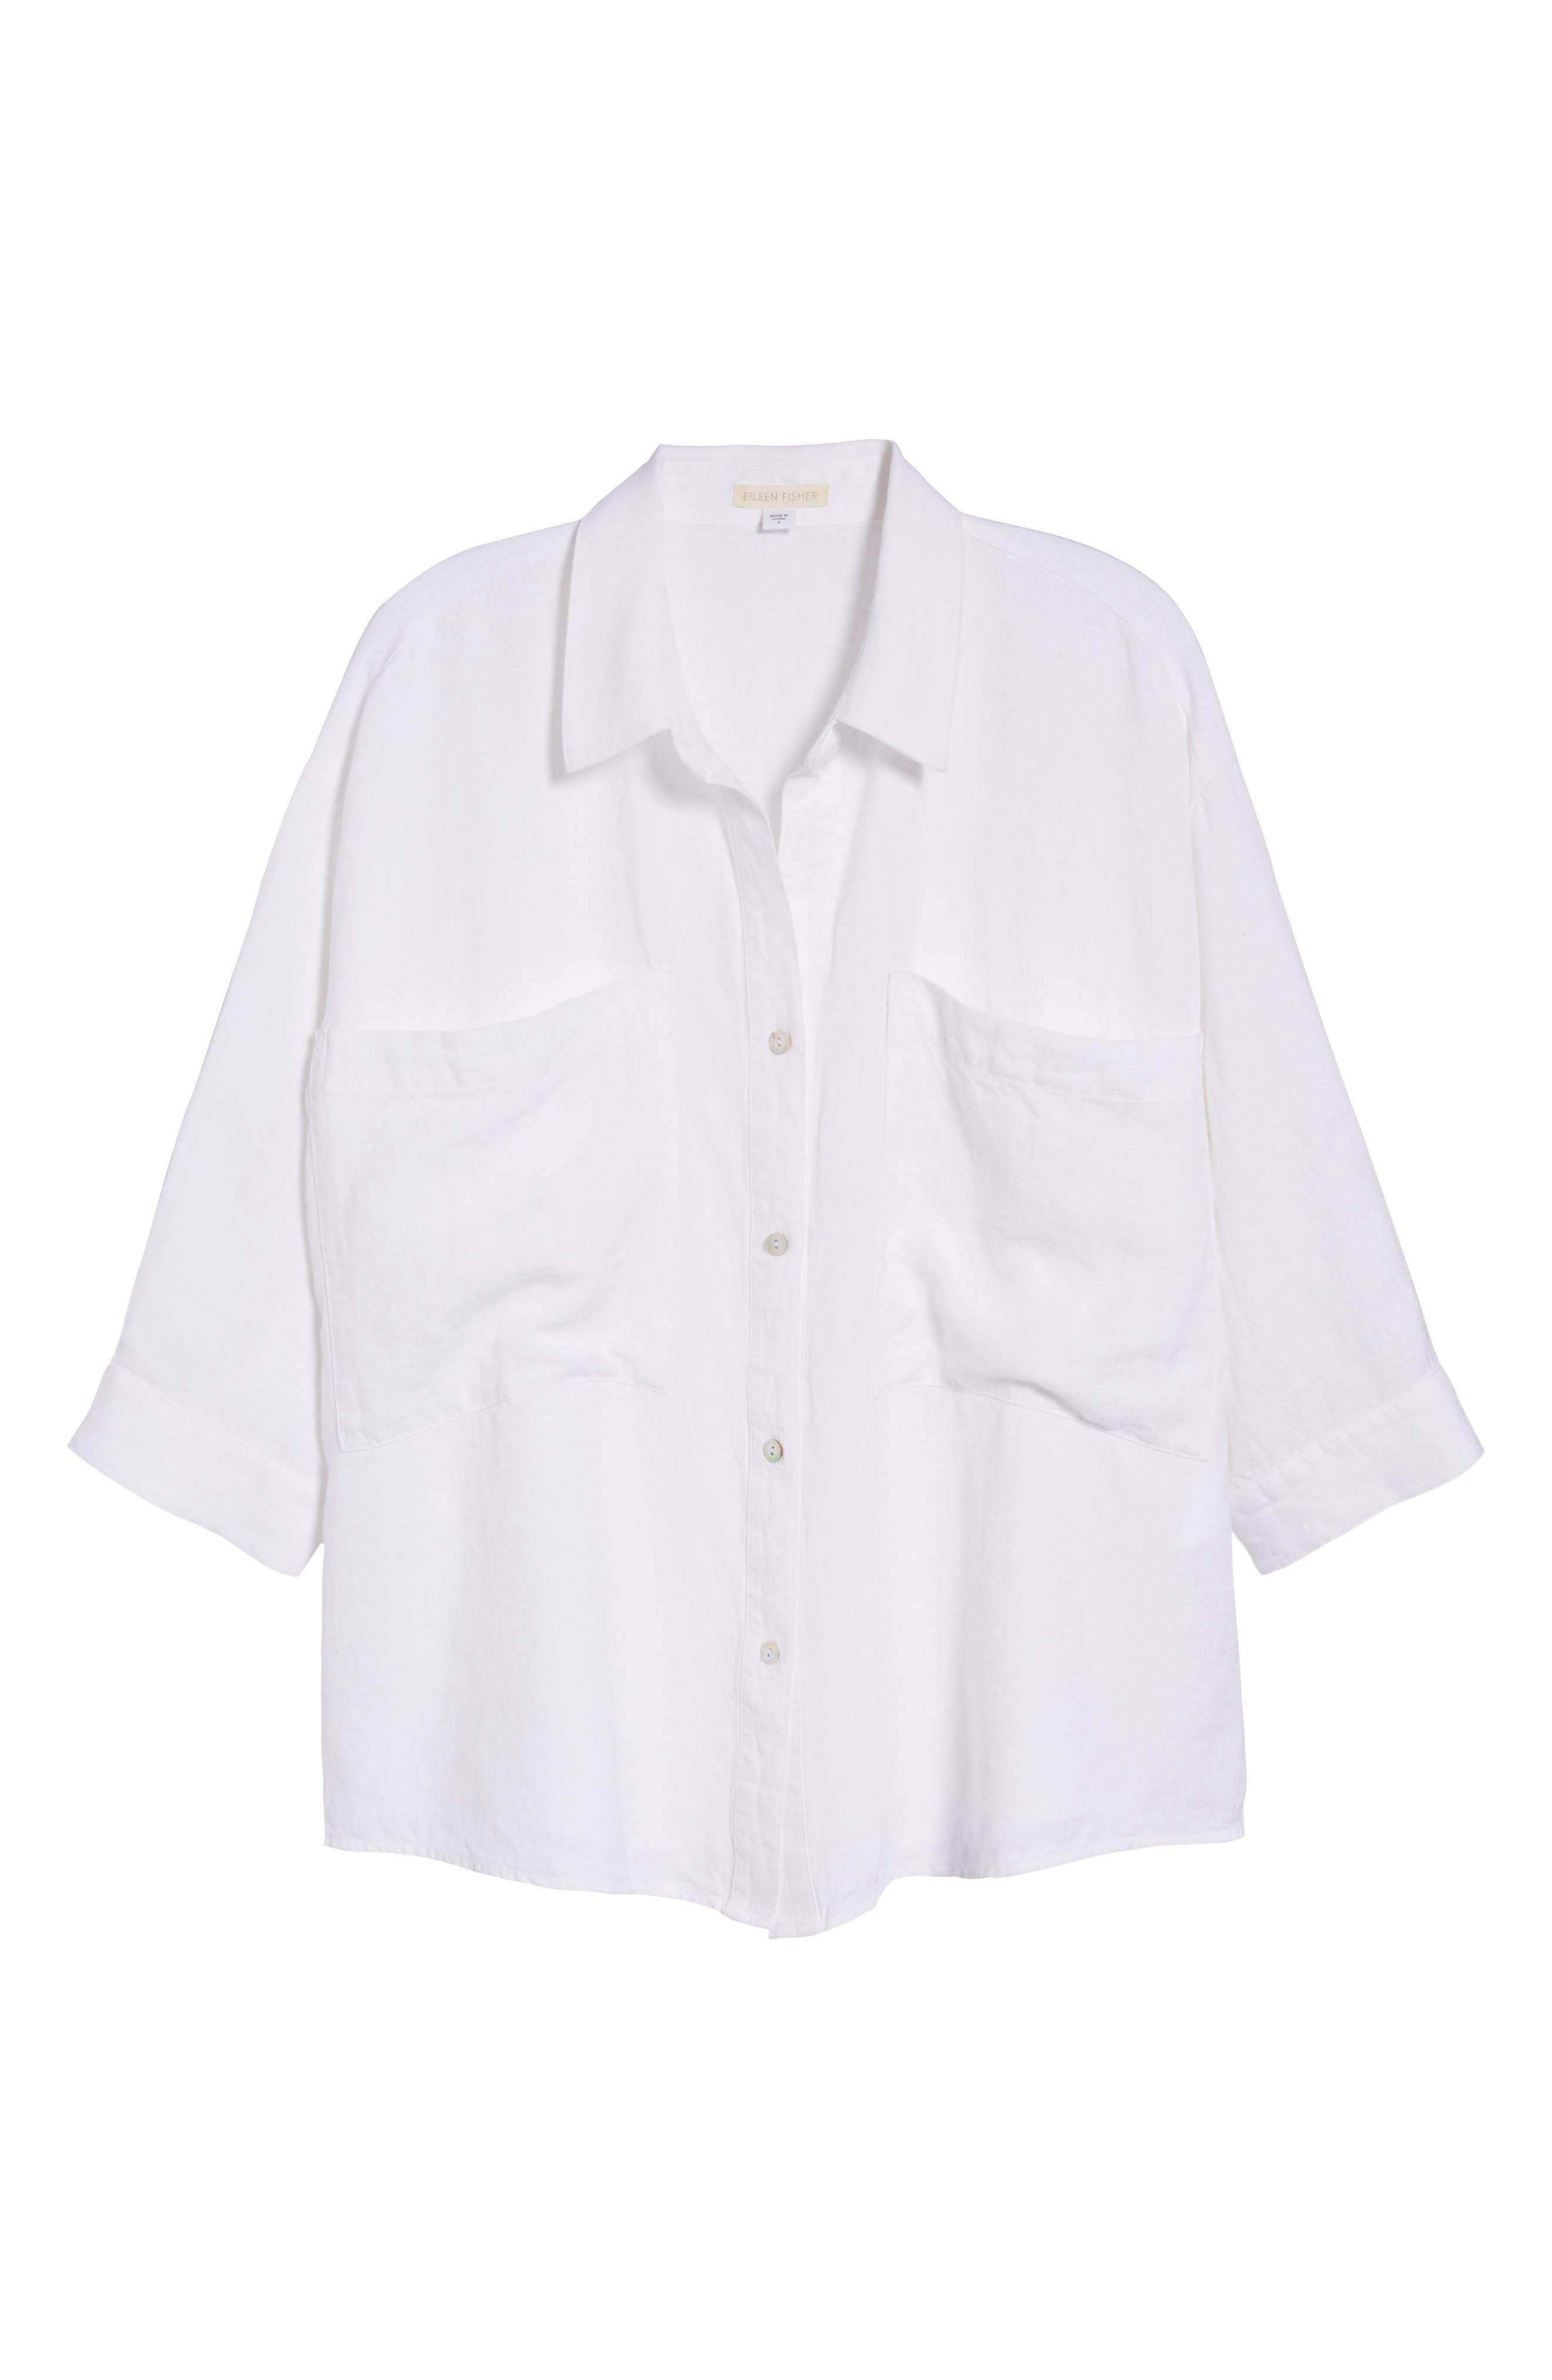 Woven Linen Blend Blouse,                             Alternate thumbnail 7, color,                             White